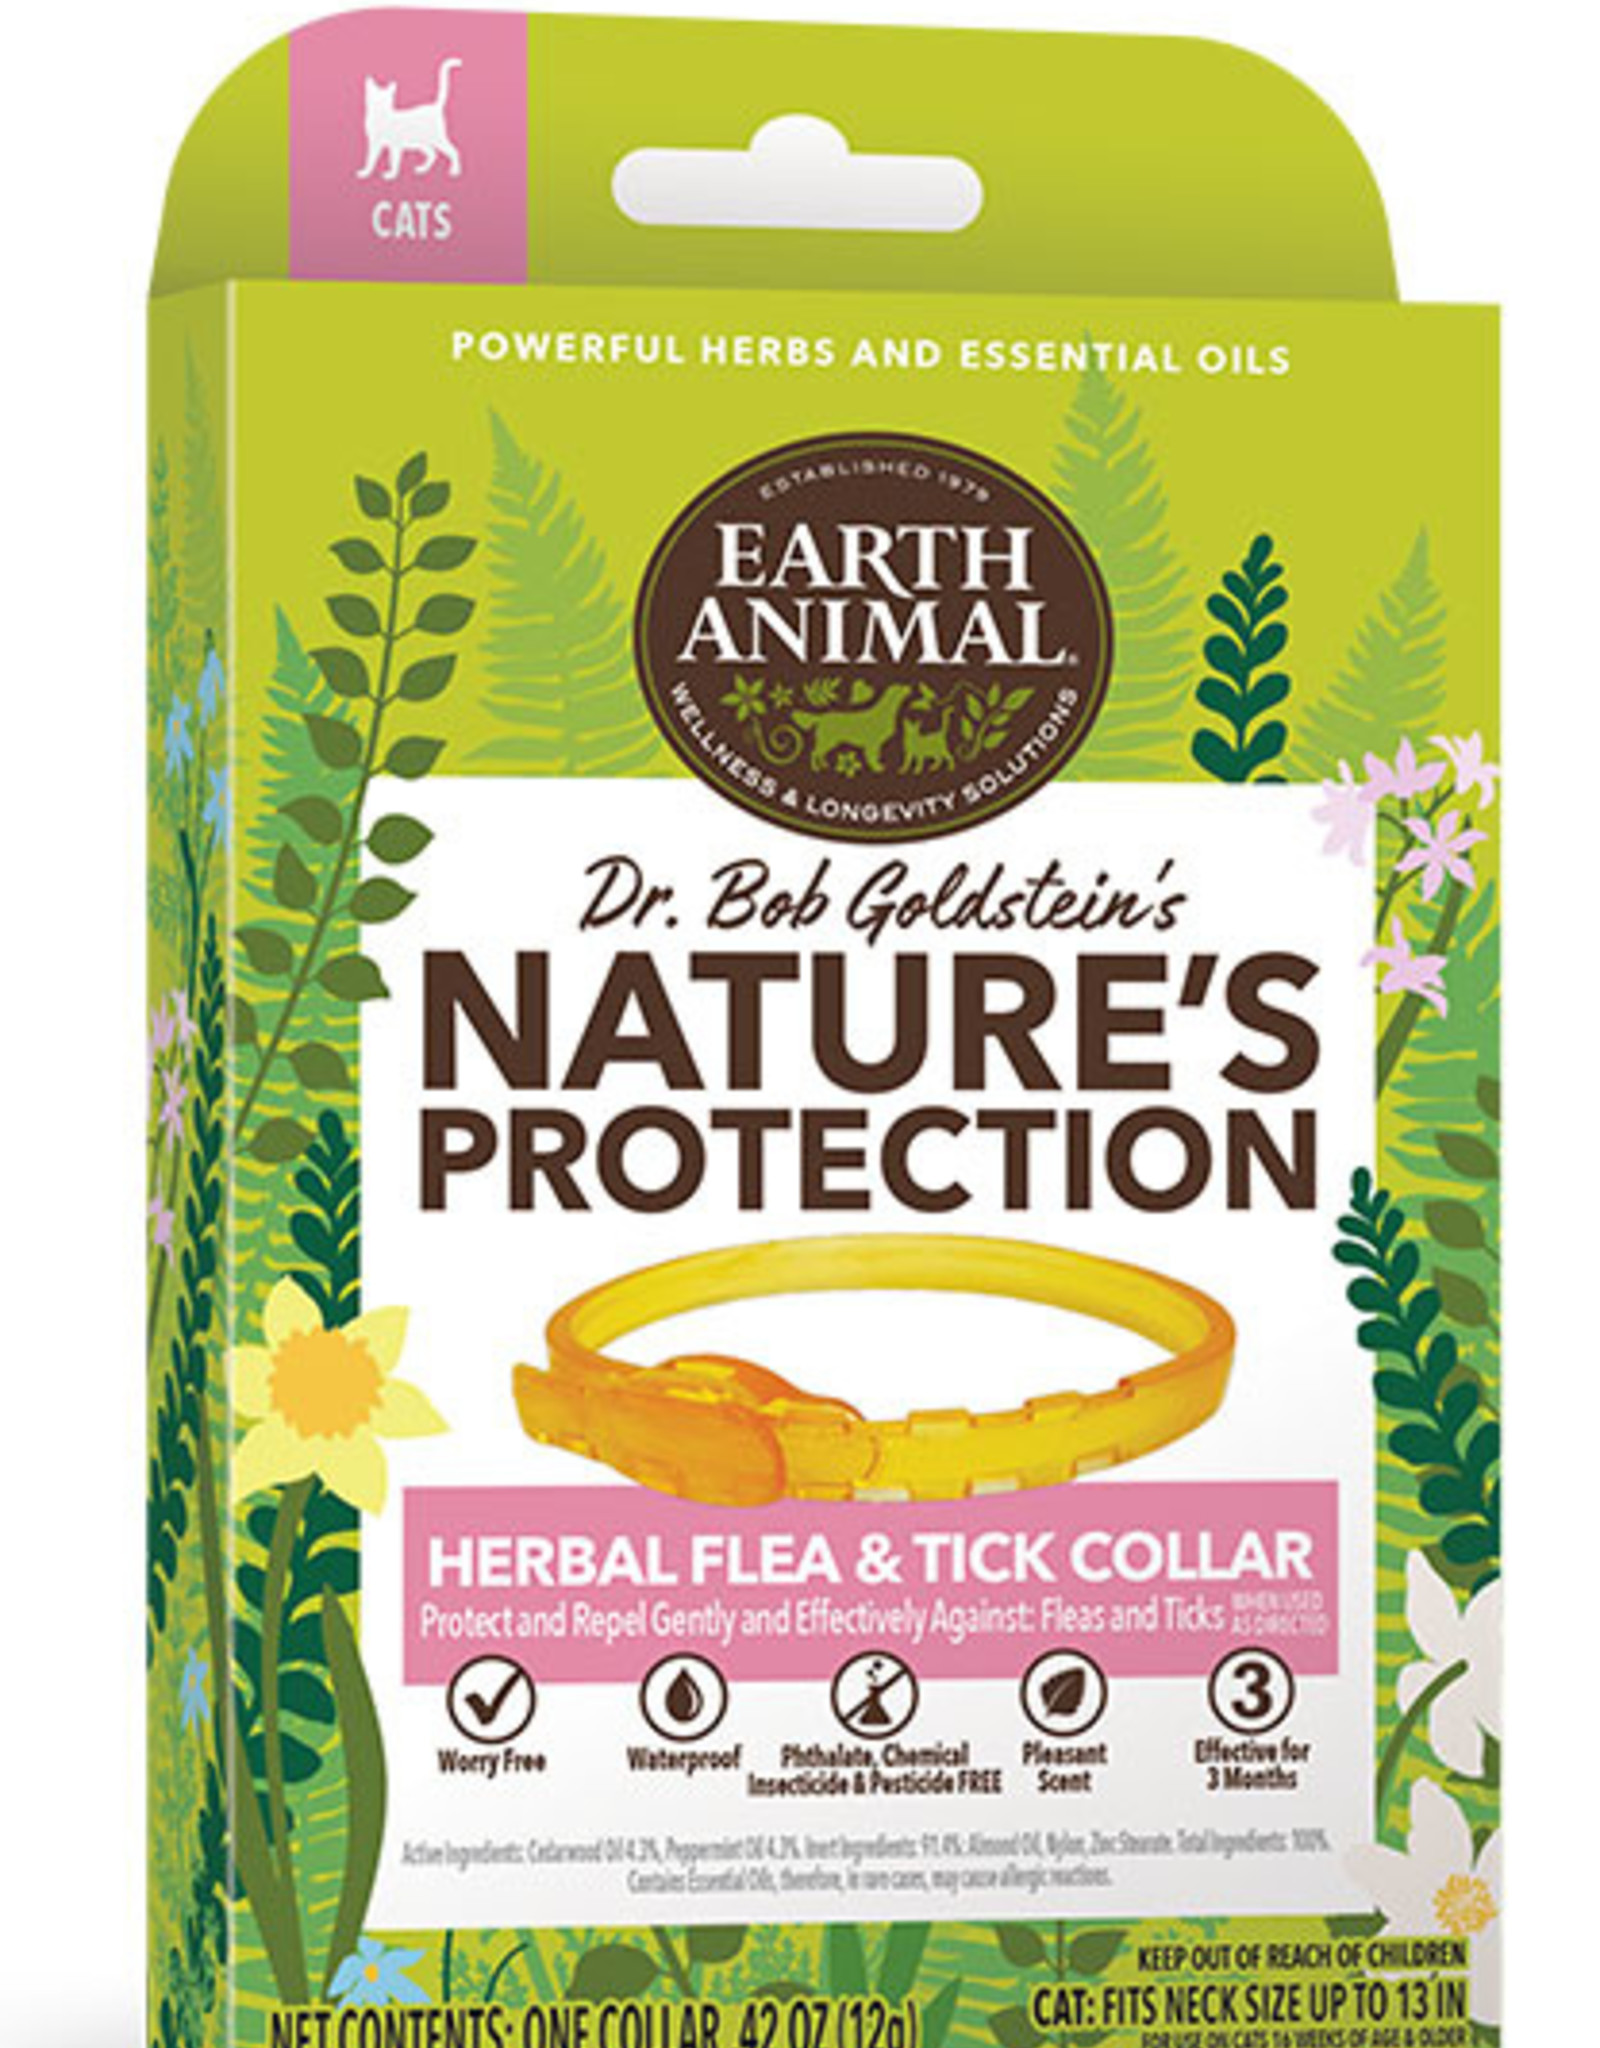 Earth Animal Herbal Flea & Tick Collar for Cats